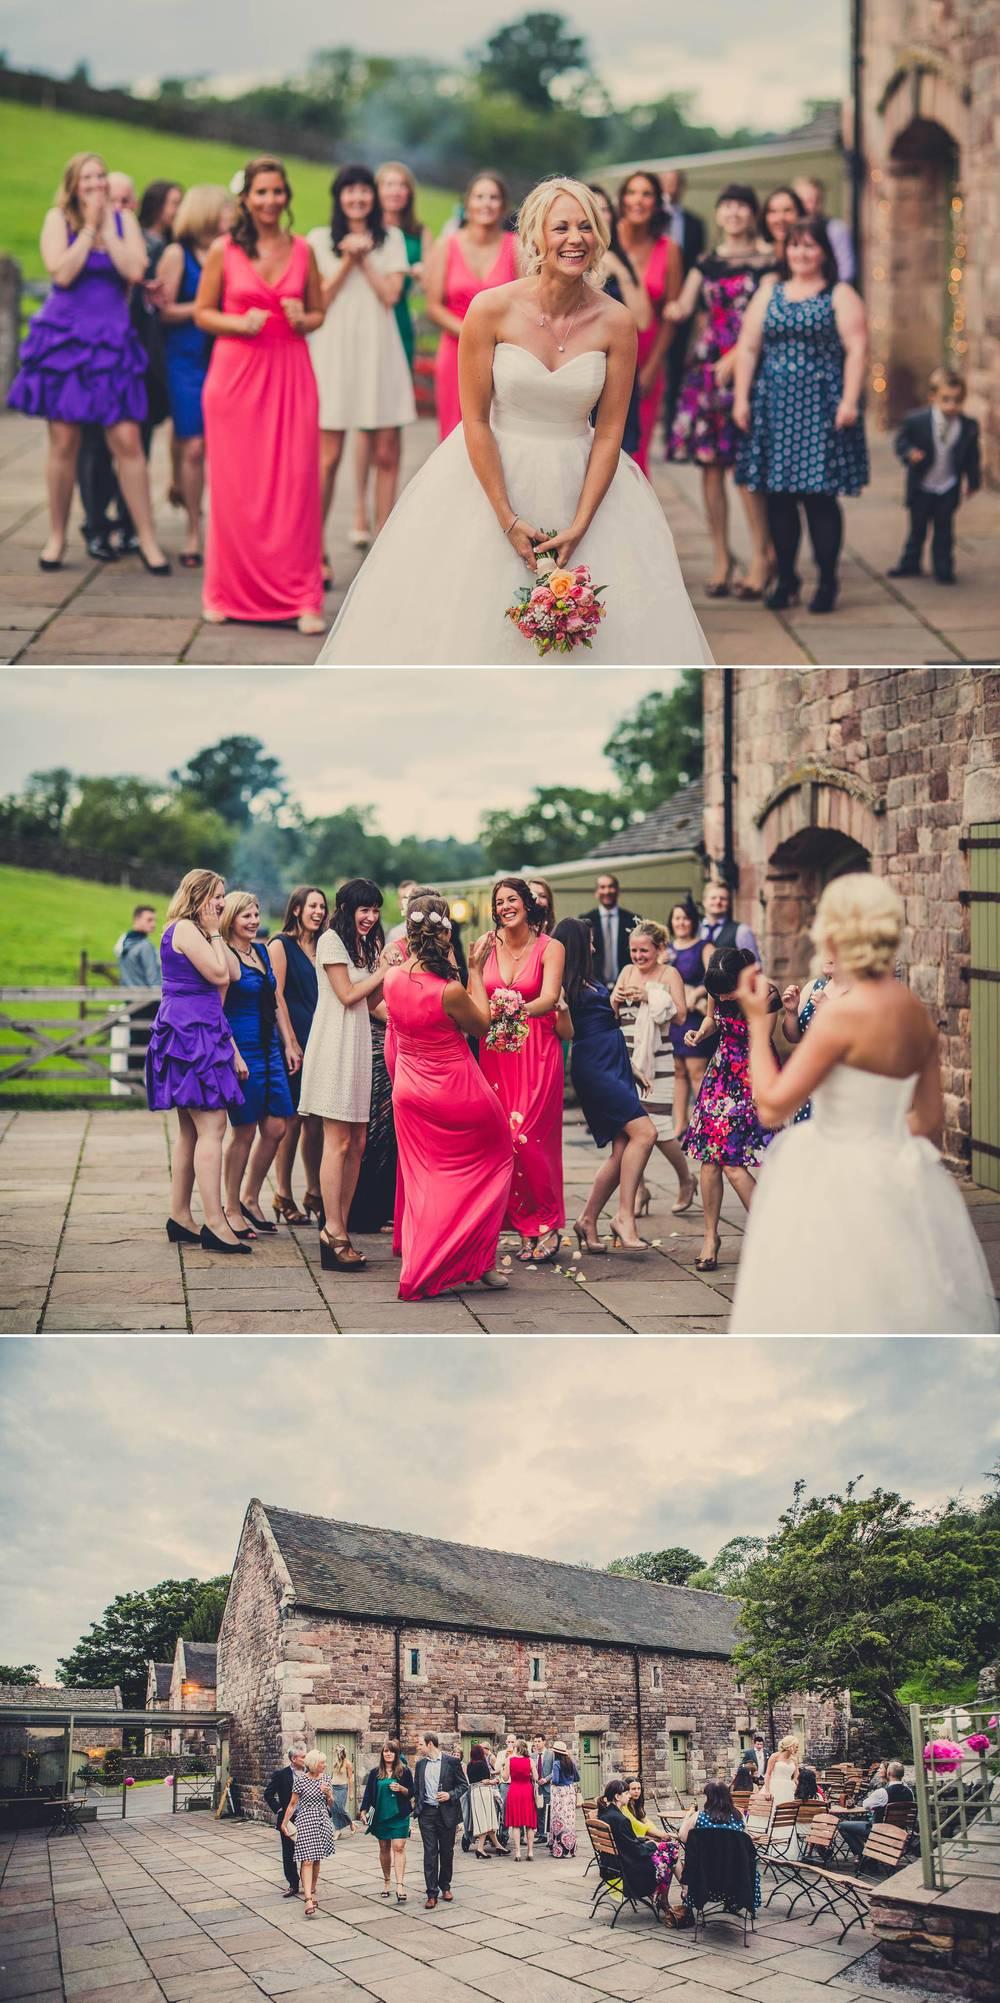 the-ashes-wedding-photographer 16.jpg